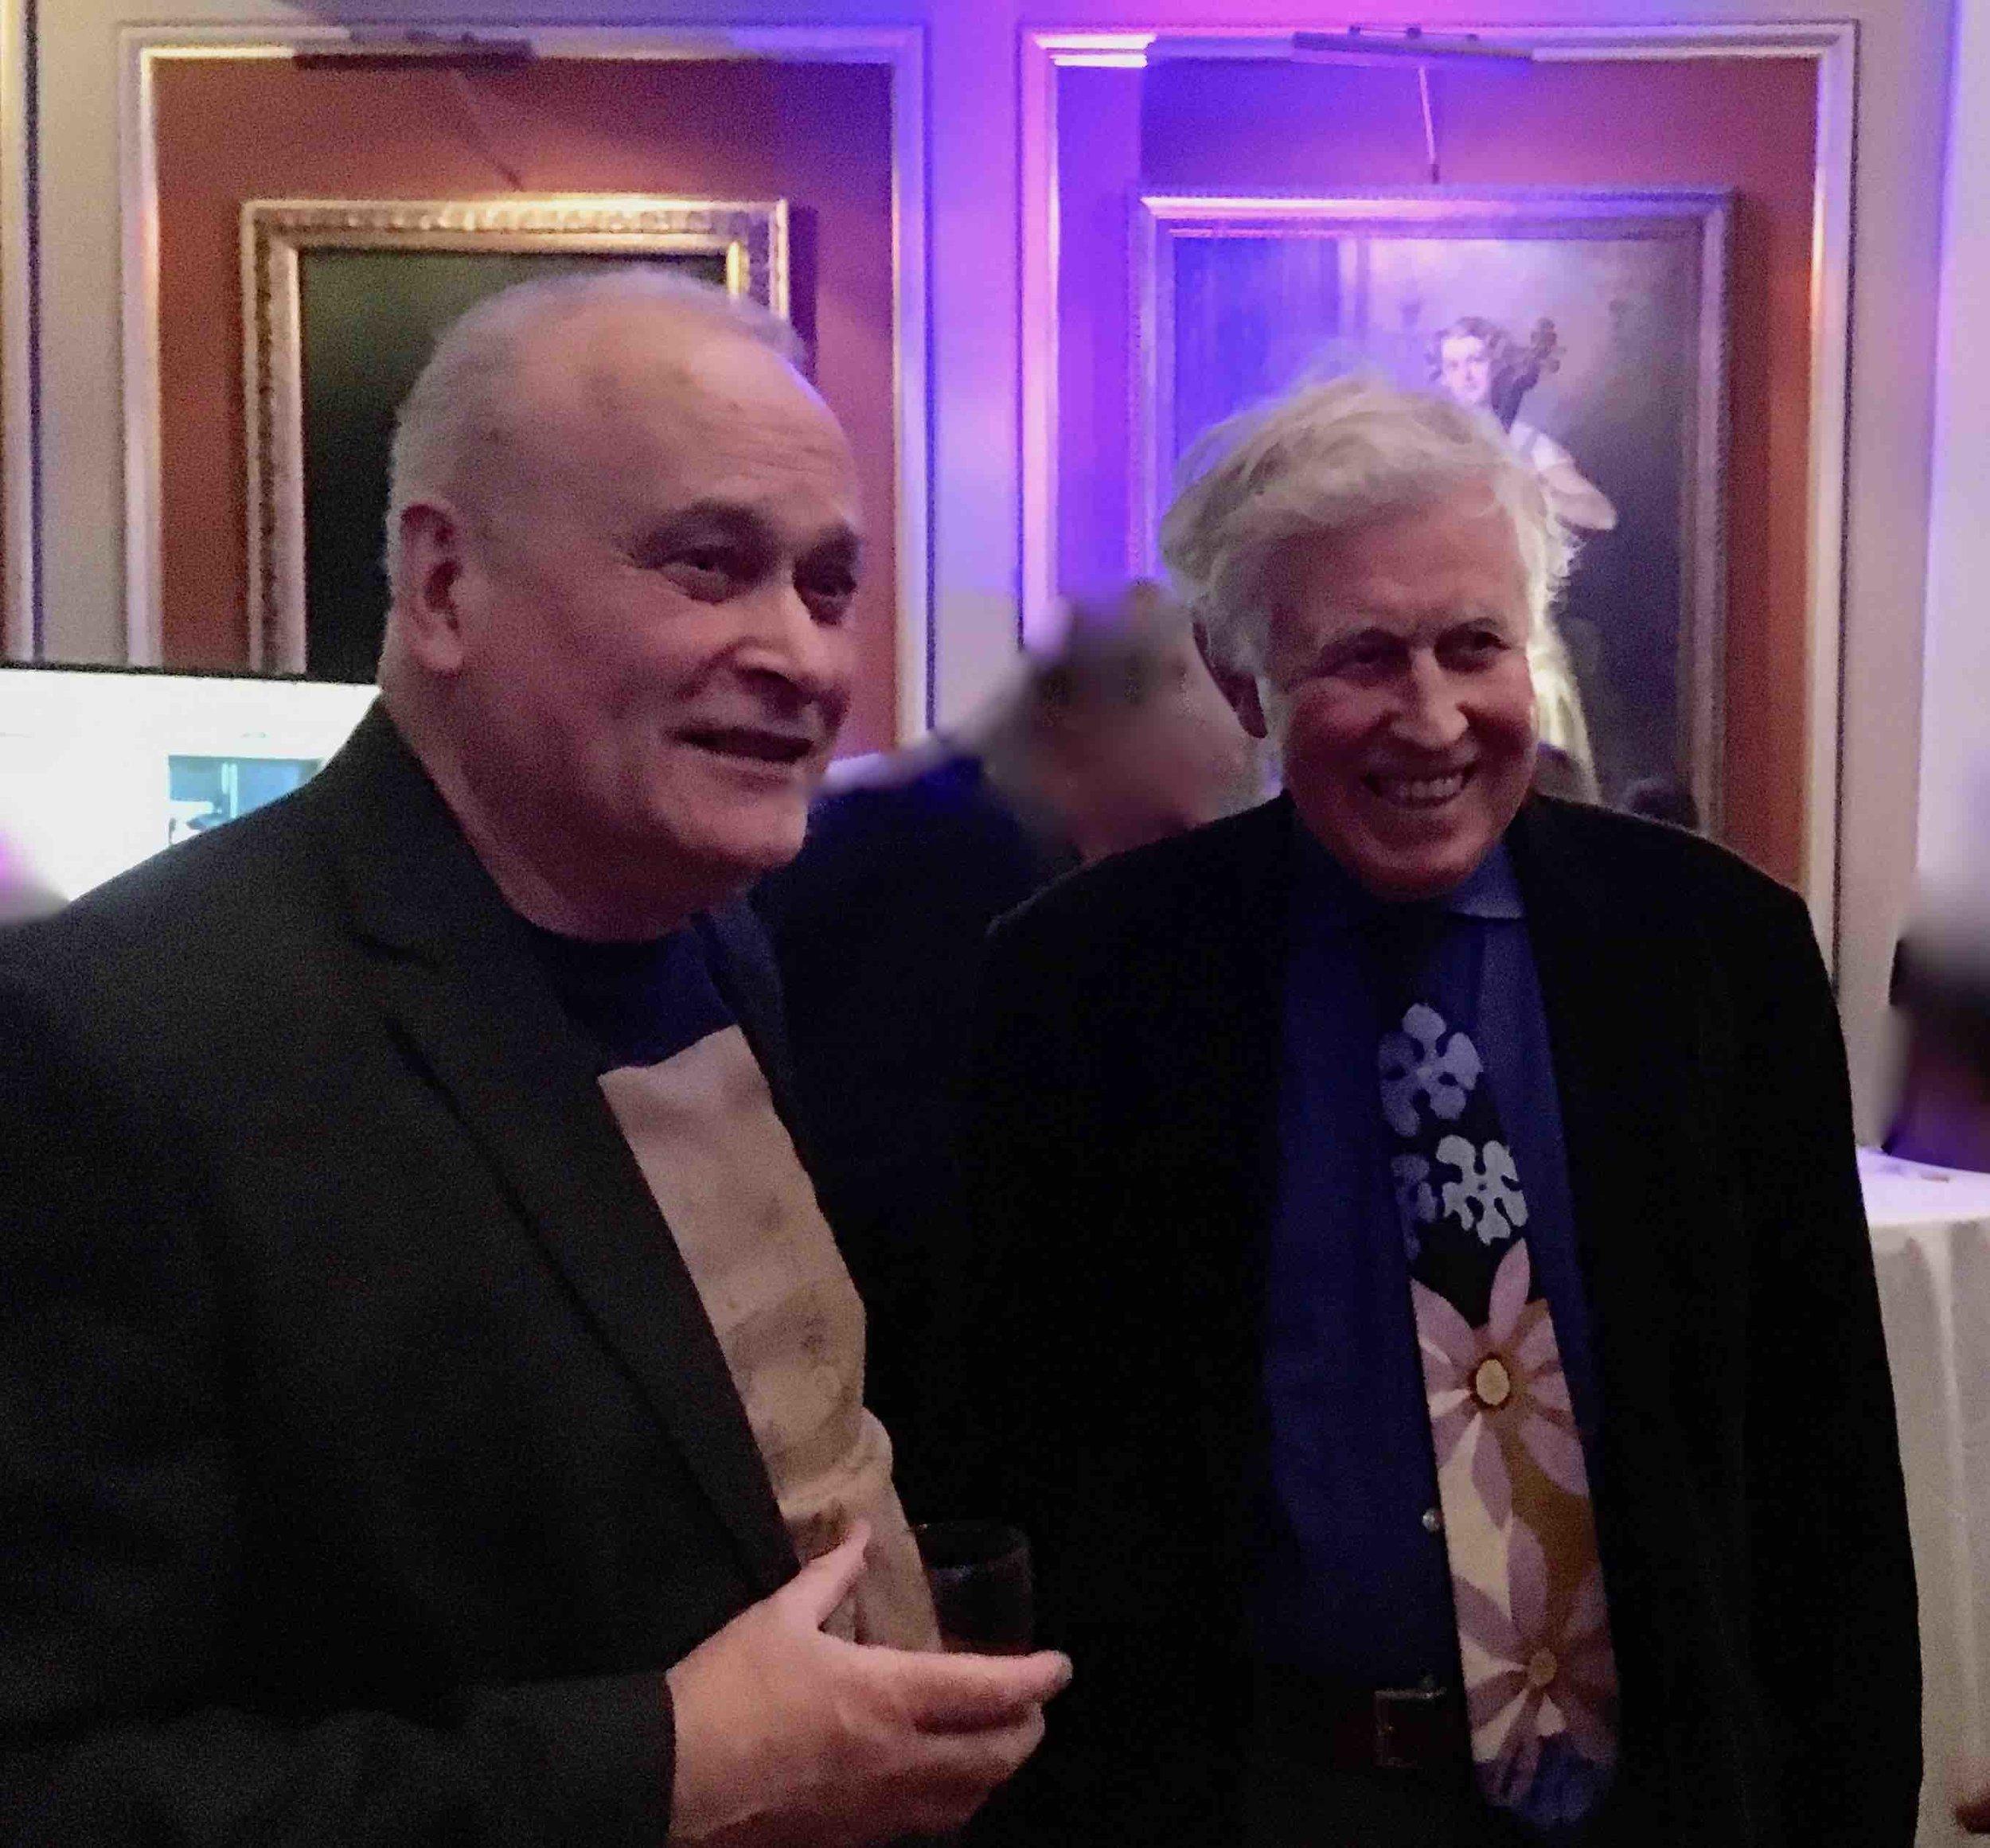 Colin Matthews and David, London, Dec 2018